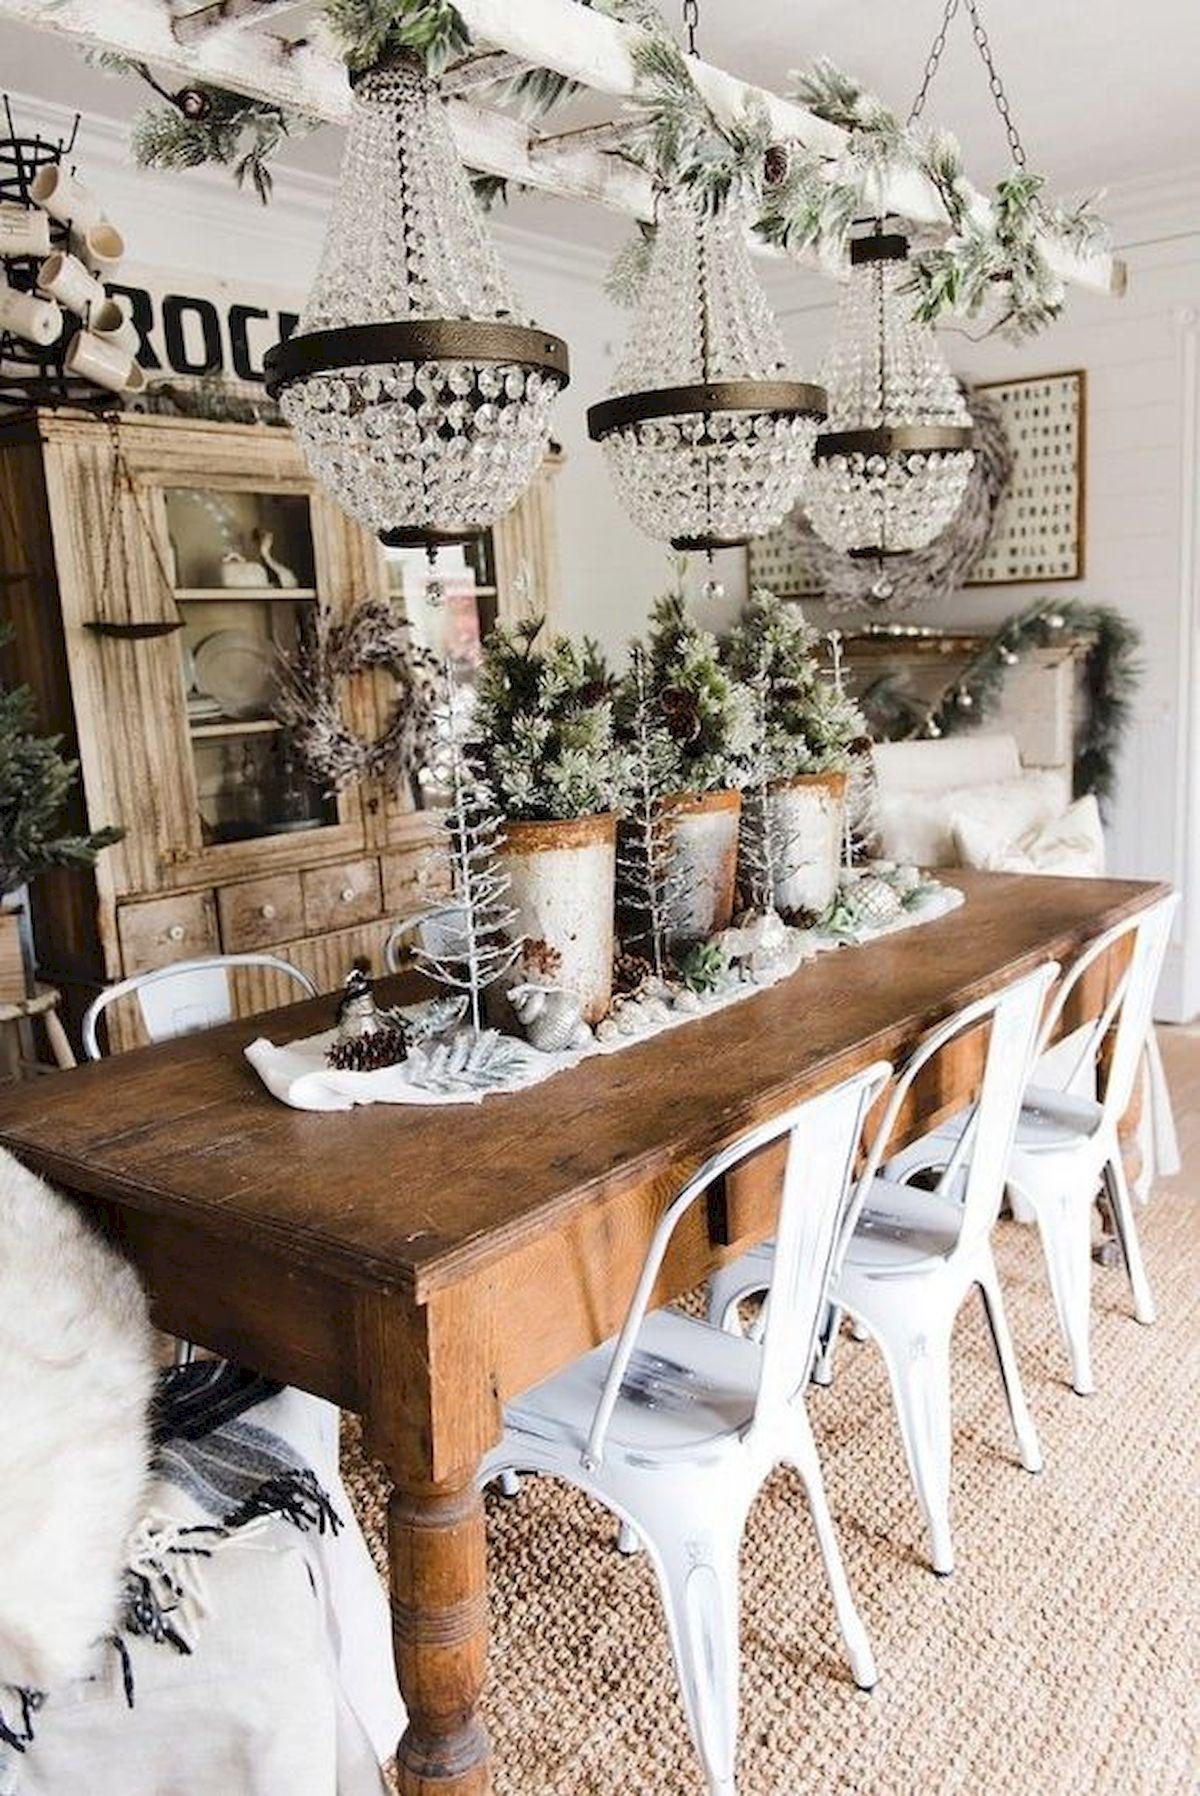 40 Adorable Farmhouse Dining Room Design And Decor Ideas (31)